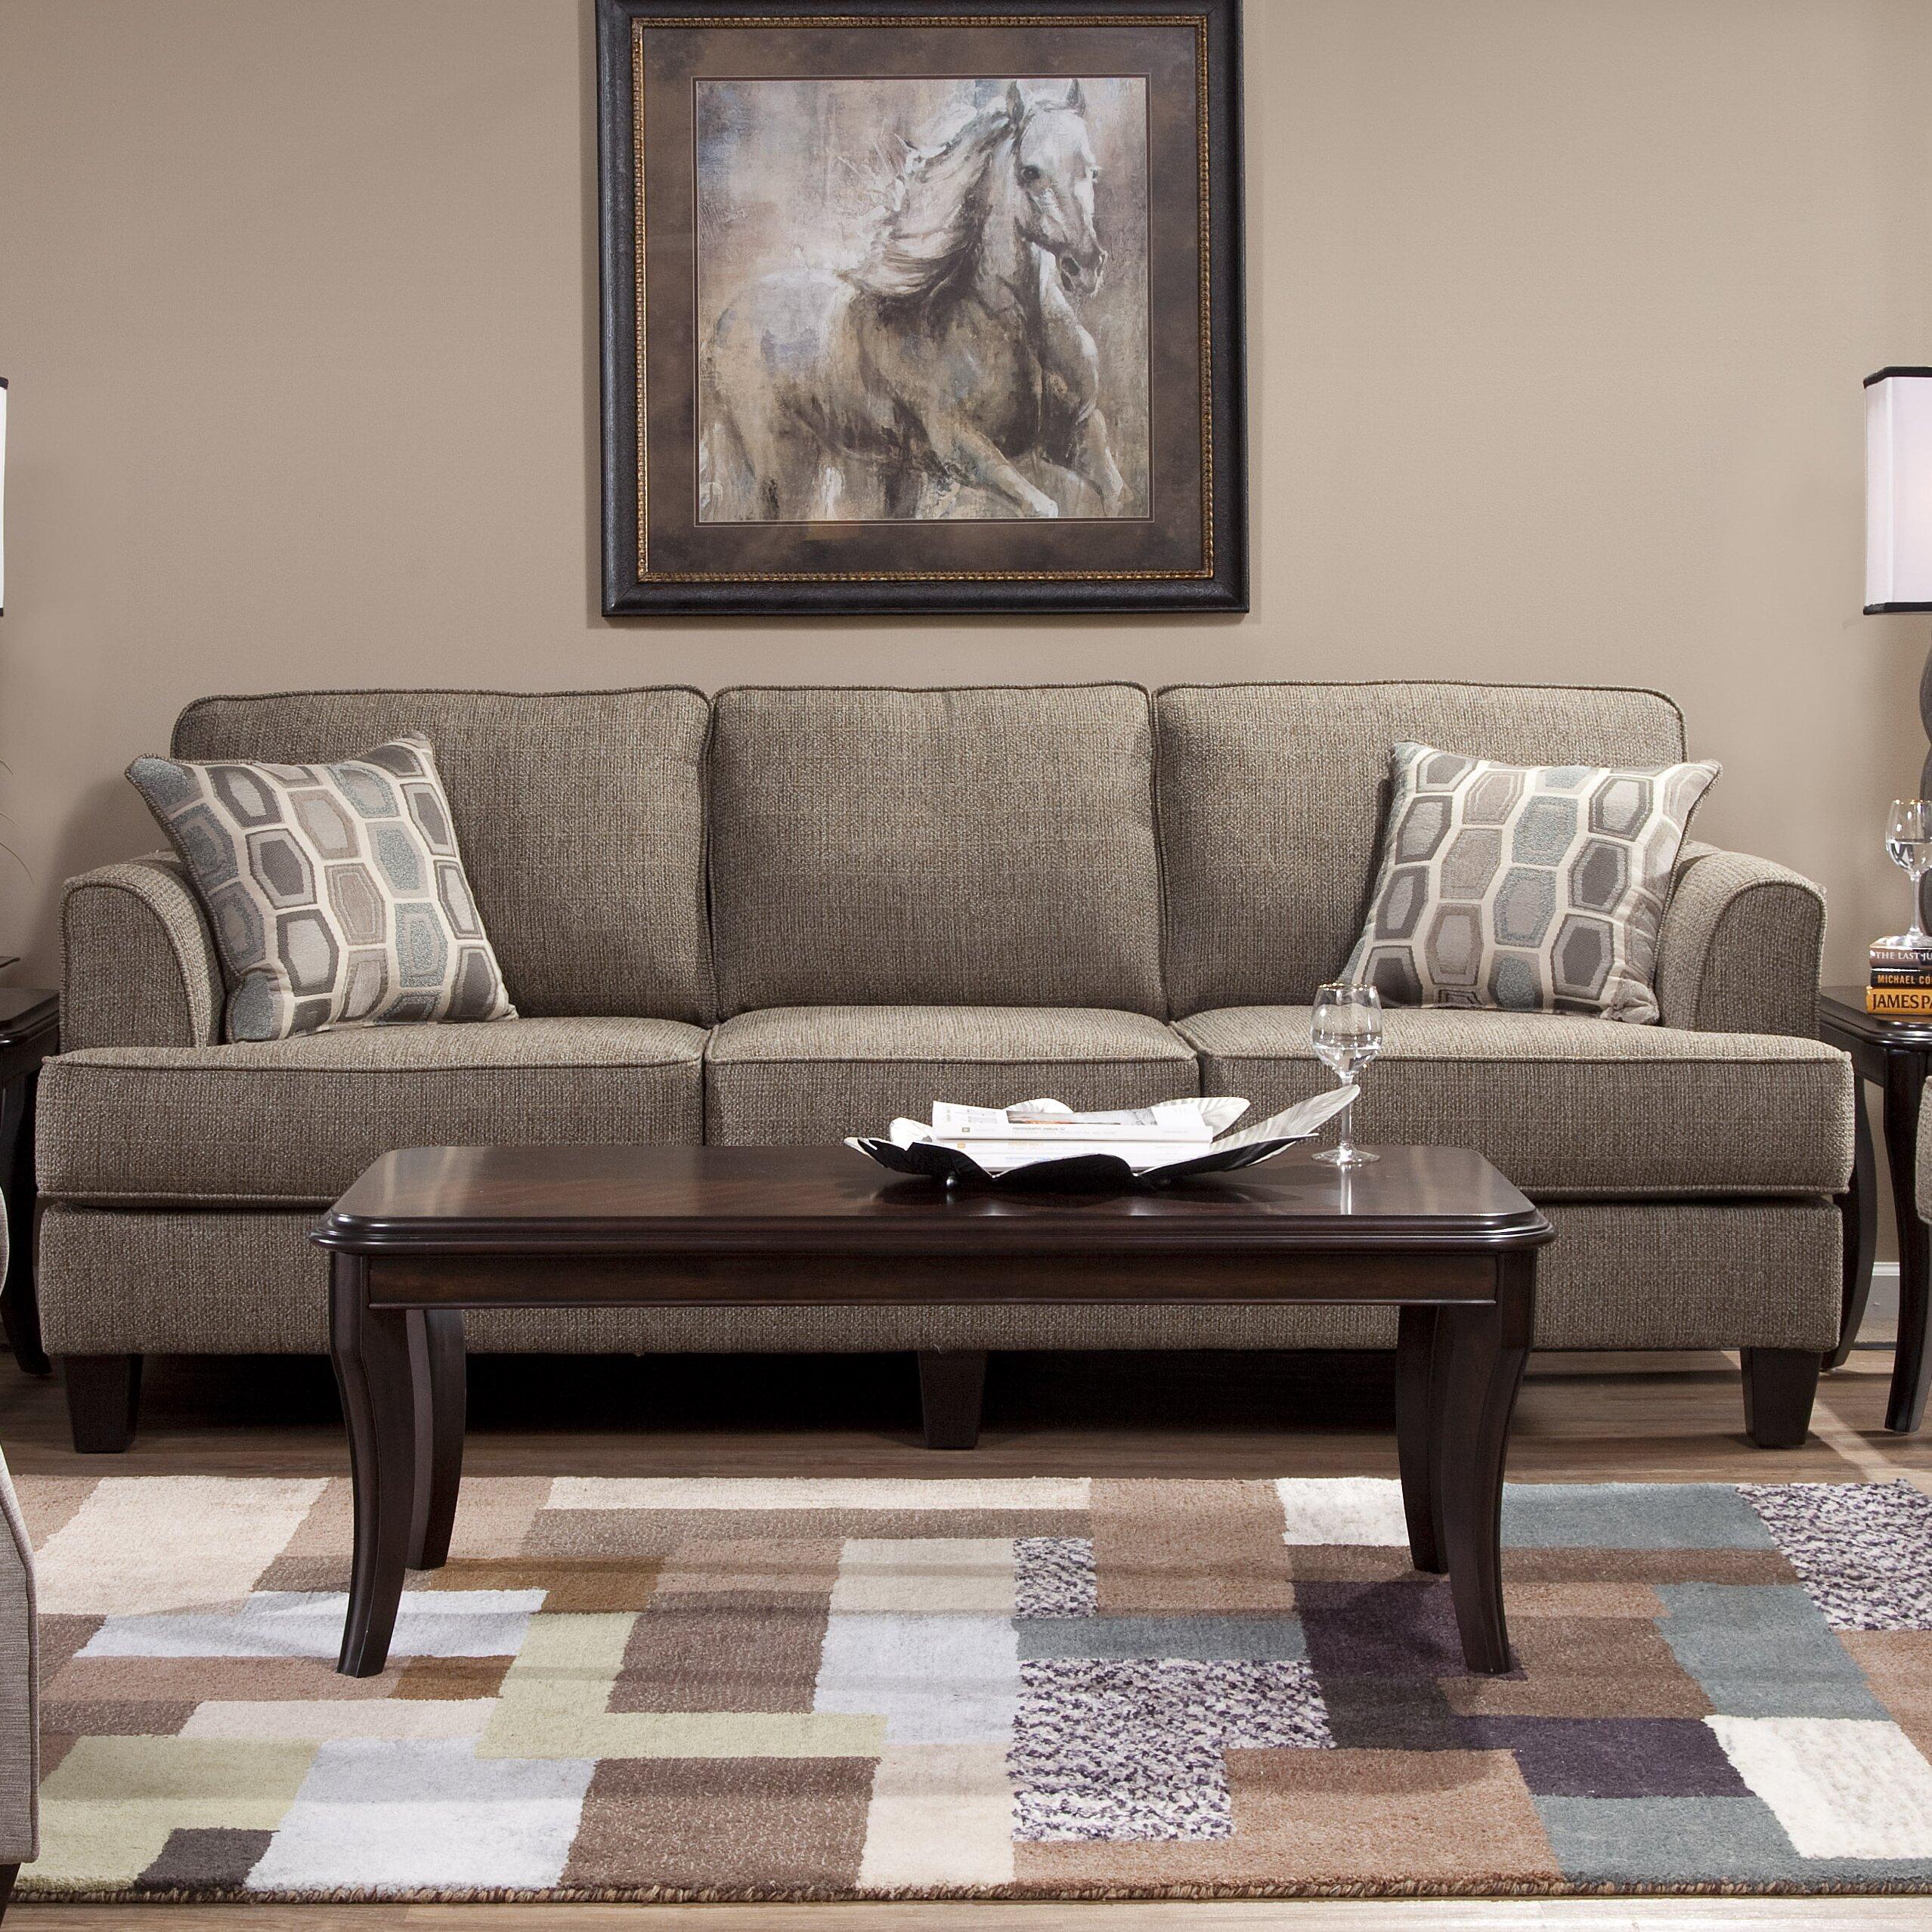 Red barrel studio serta upholstery dallas sofa reviews for Furniture one dallas